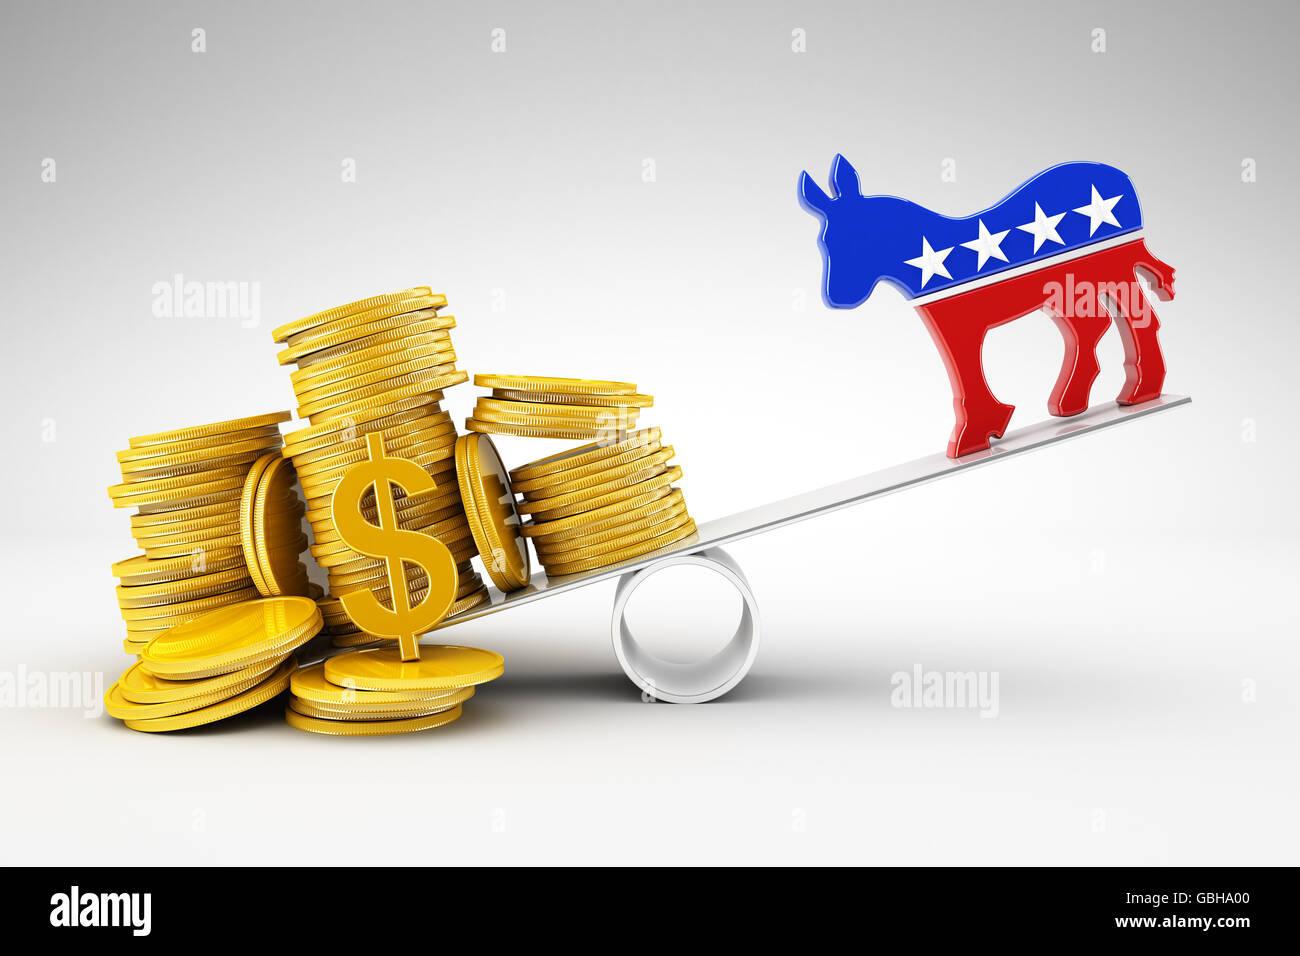 Politics and money - Stock Image